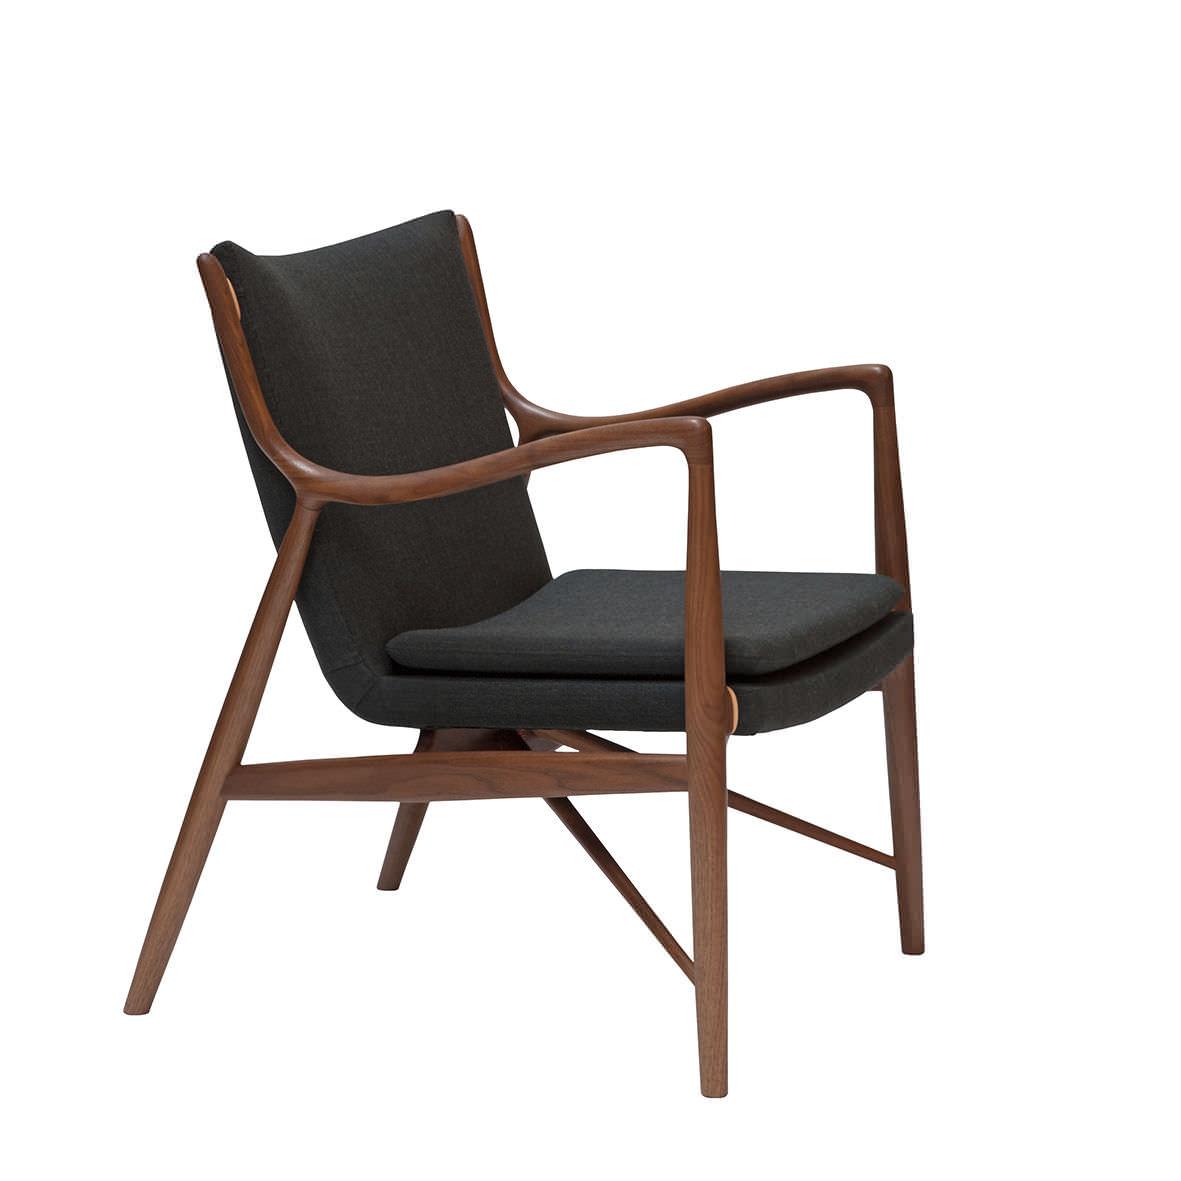 ... Sessel / Skandinavisches Design / Holz / Stoff / Leder ...